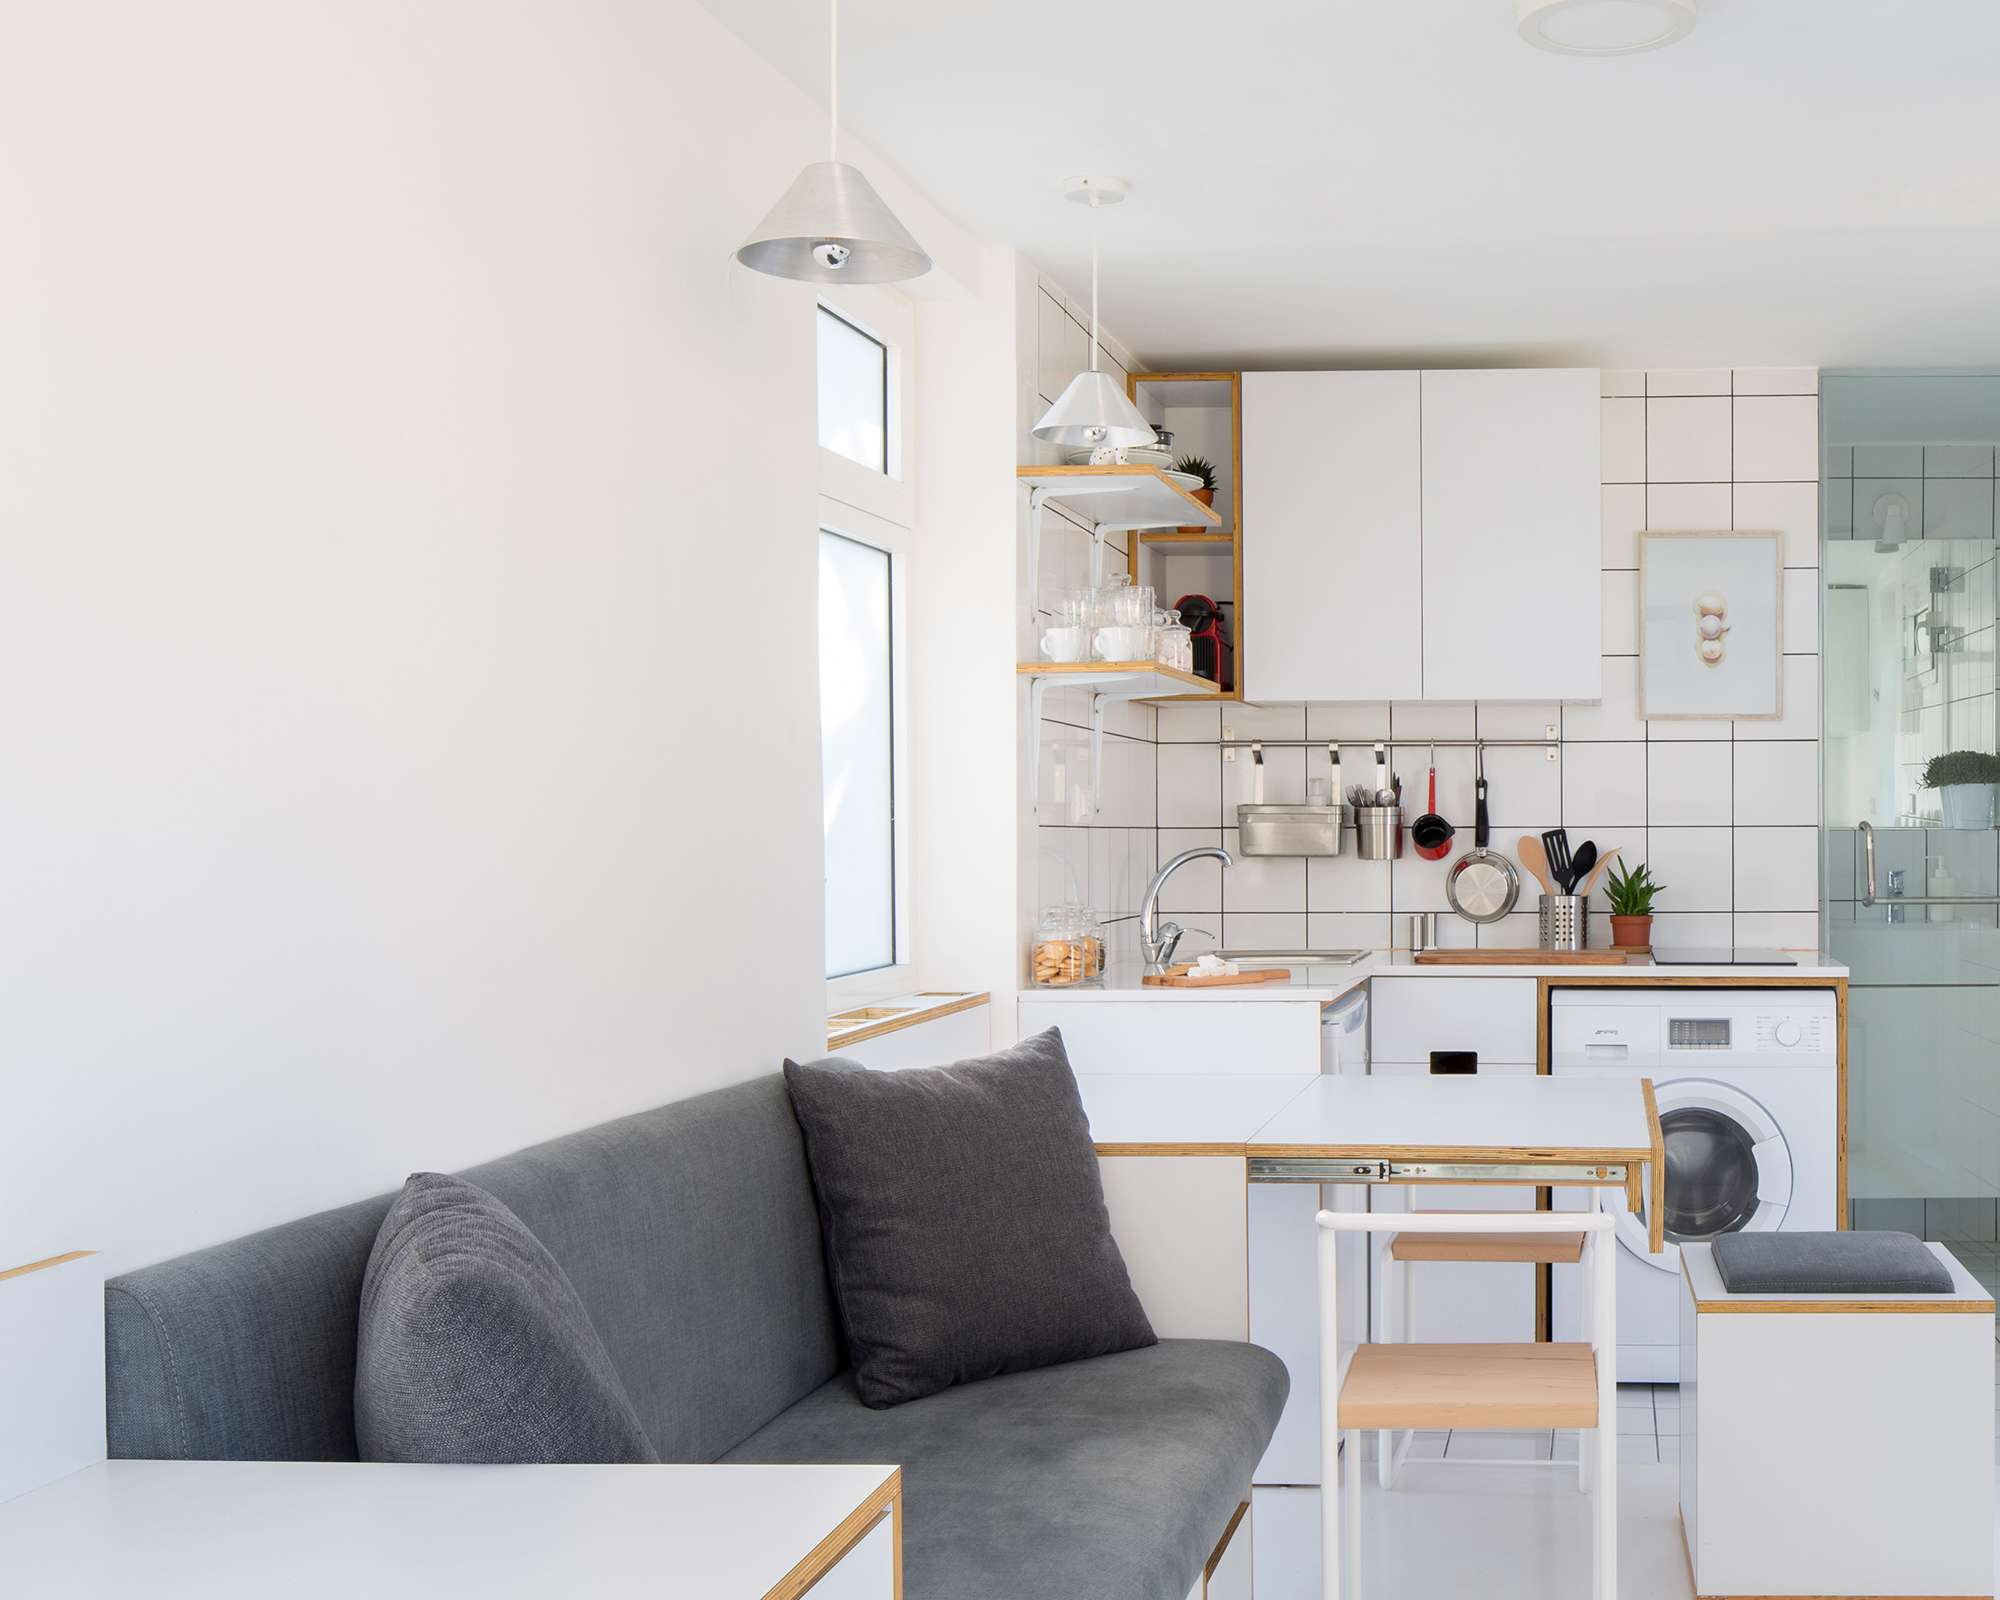 The Shoebox micro-apartment by Elie Metni sofa